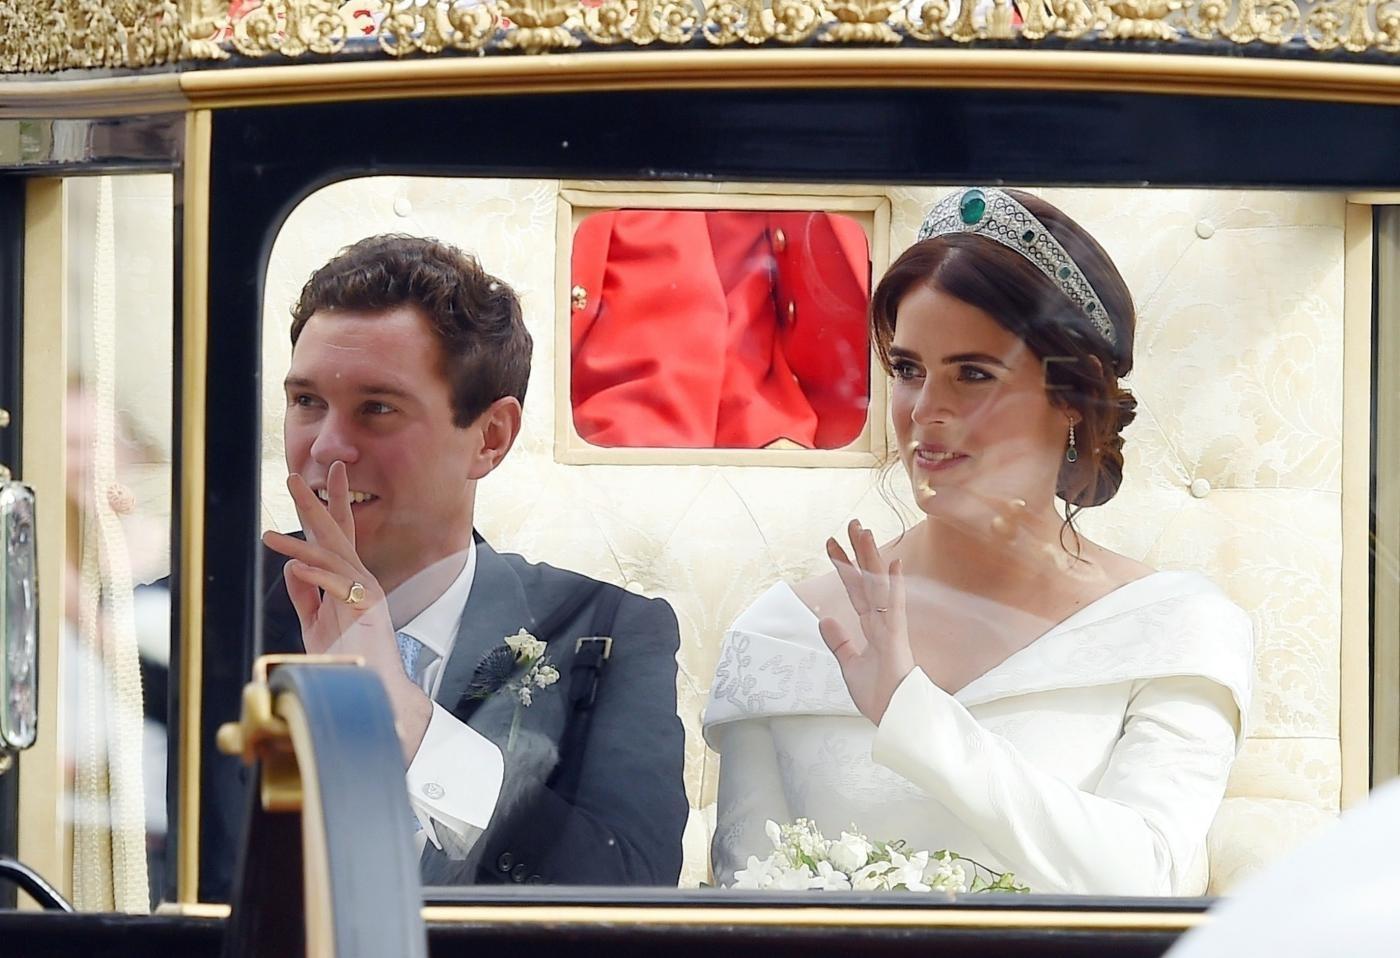 Nuovo royal wedding, la principessa Eugenie sposa Jack Brooksbank